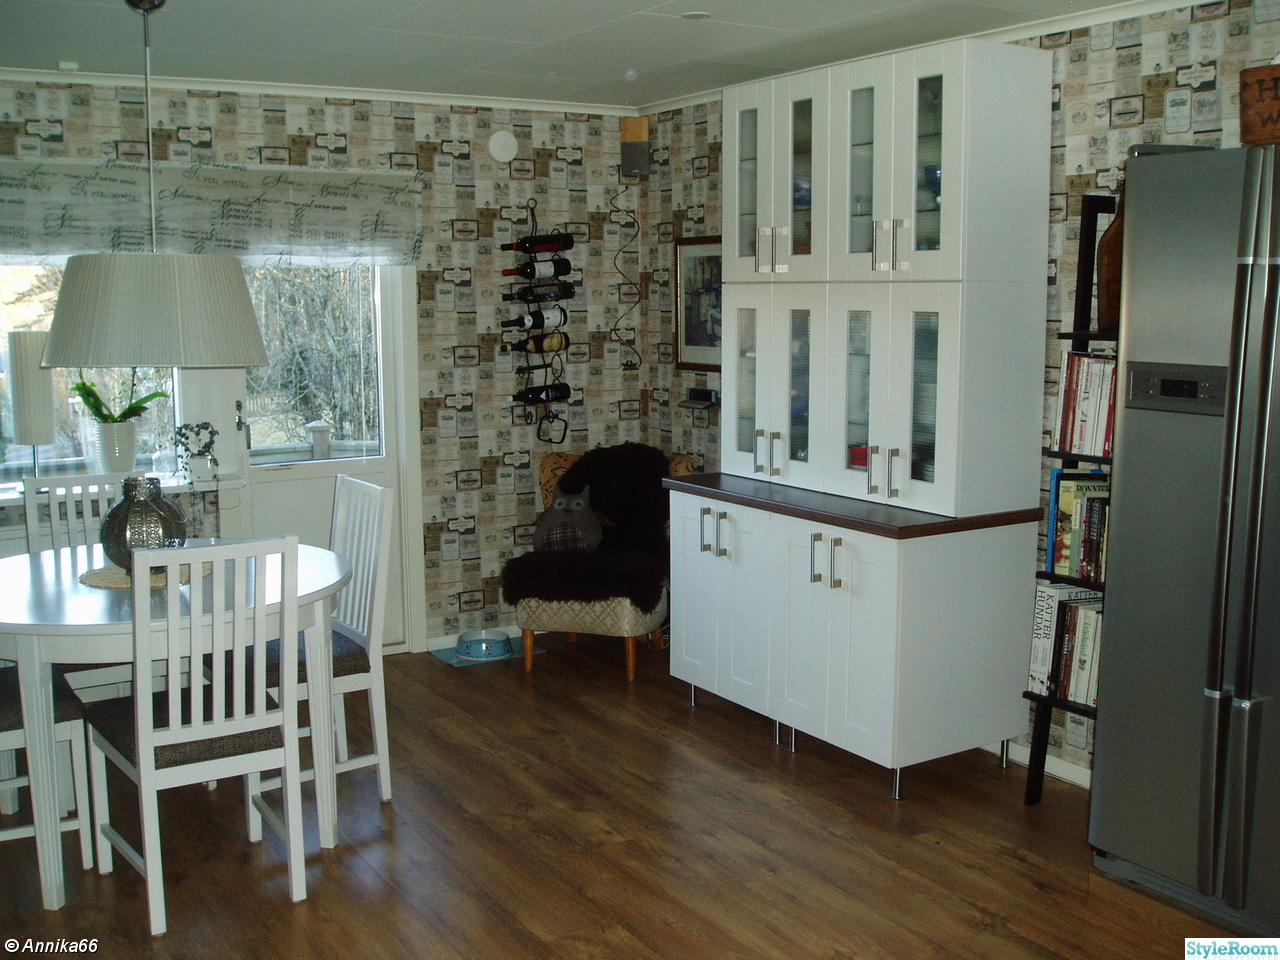 Billiga Koksbord : vitt koksbord  ,matbord,englesson,koksbord,koksstolar,vitt